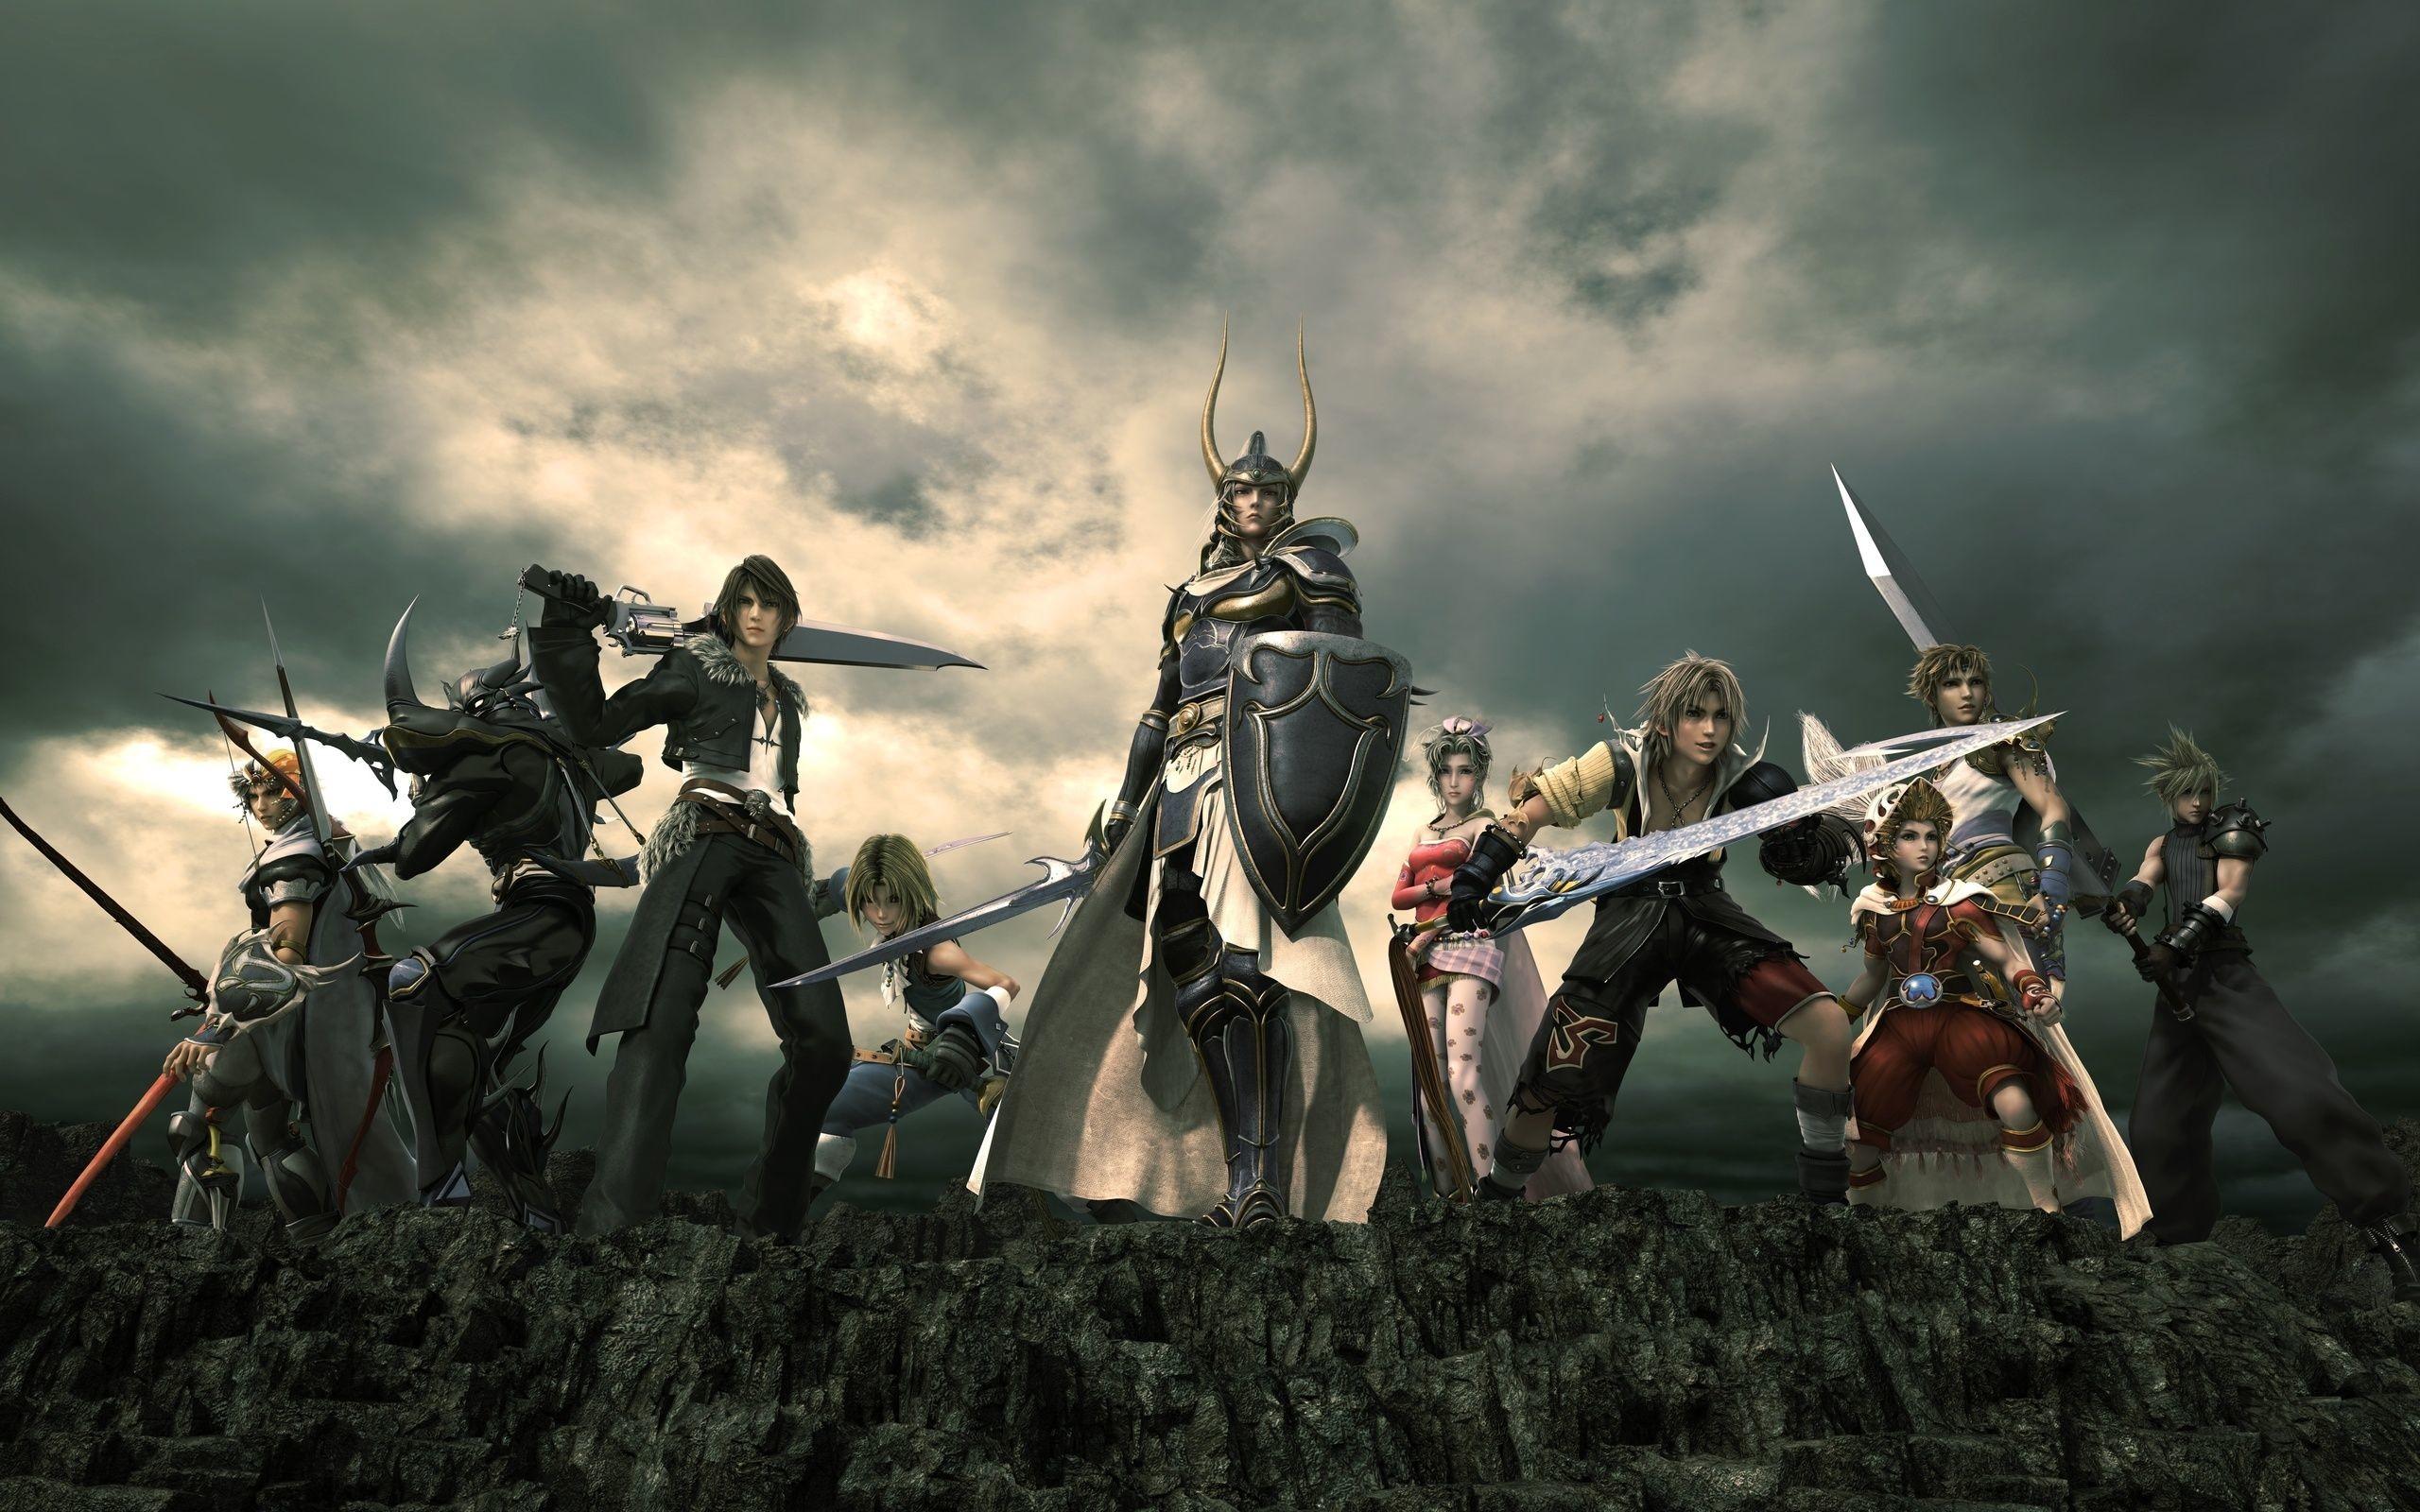 final fantasy, last fantasy, cloud strife, weapons .